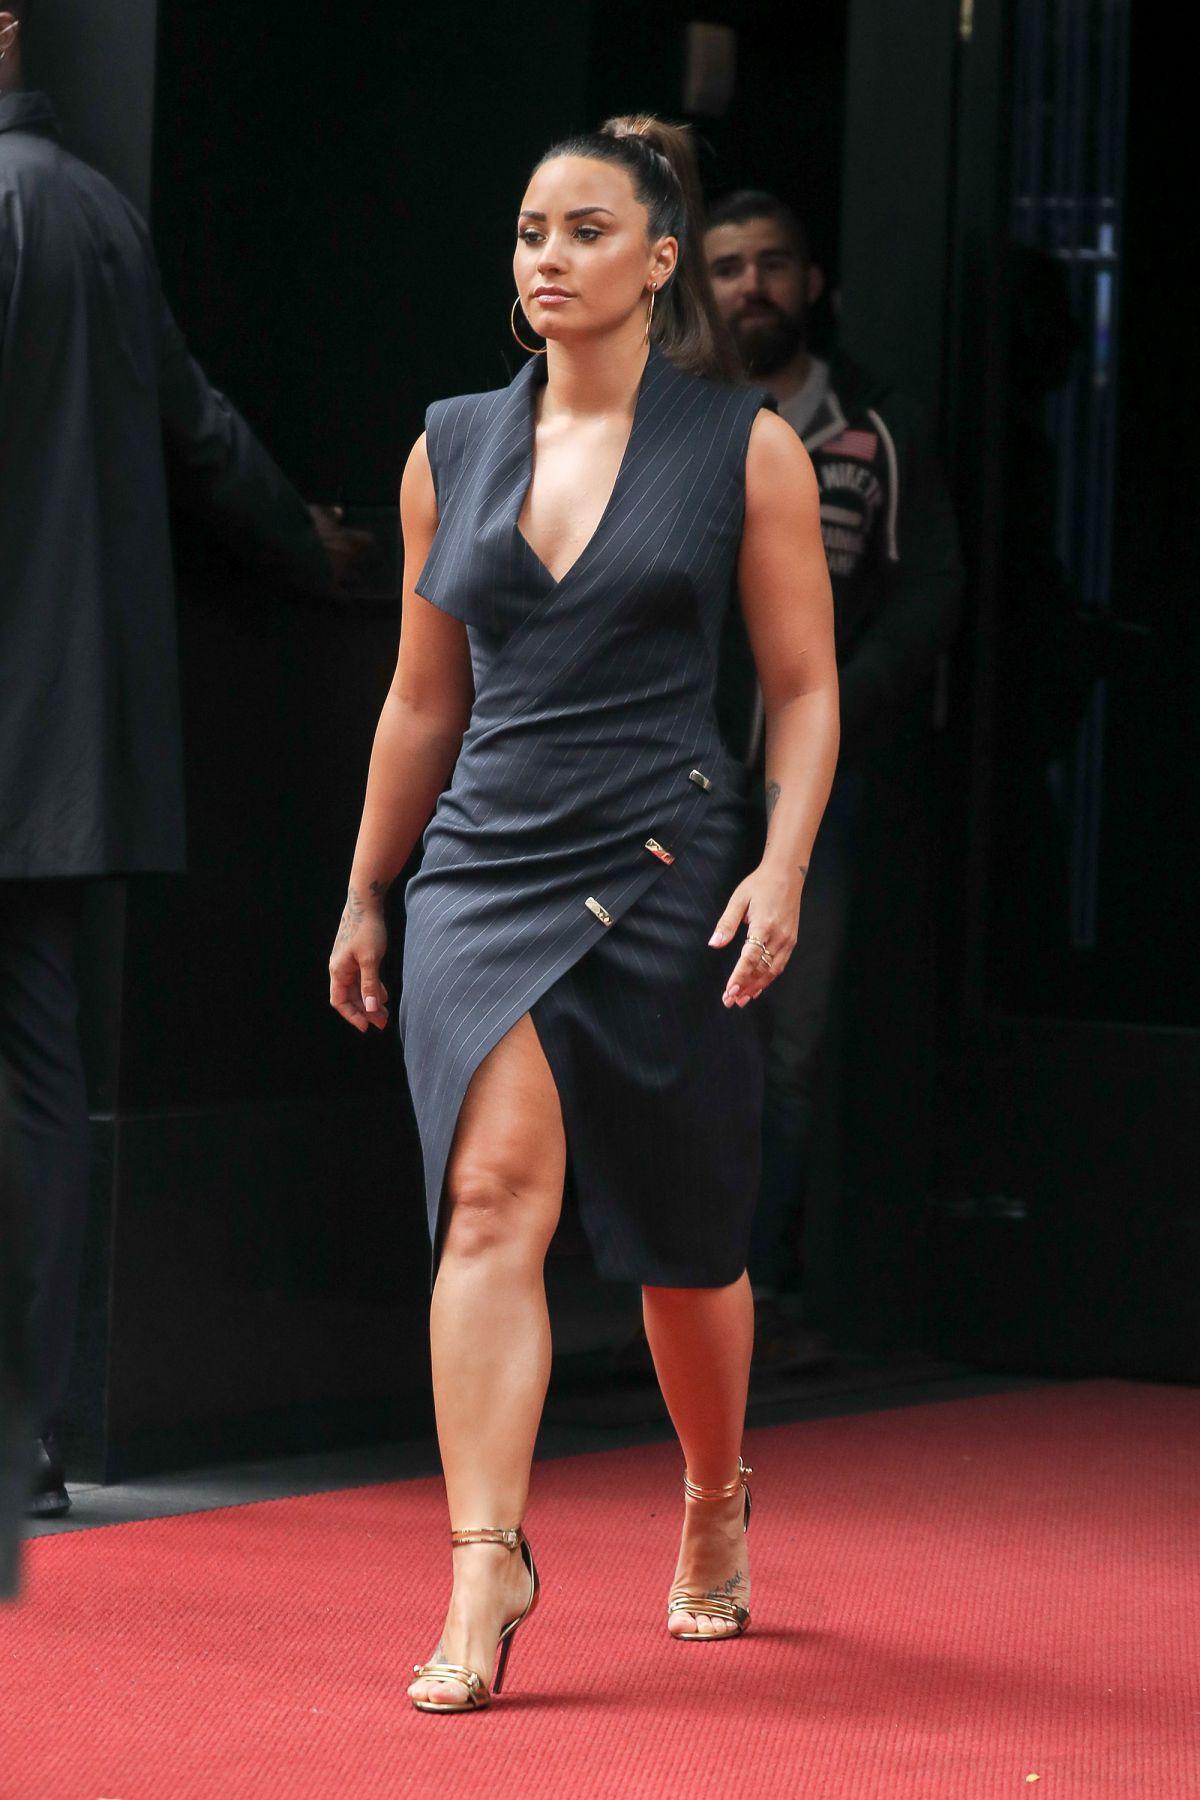 DEMI LOVATO Leaves Her Hotel in New York 09/06/2017